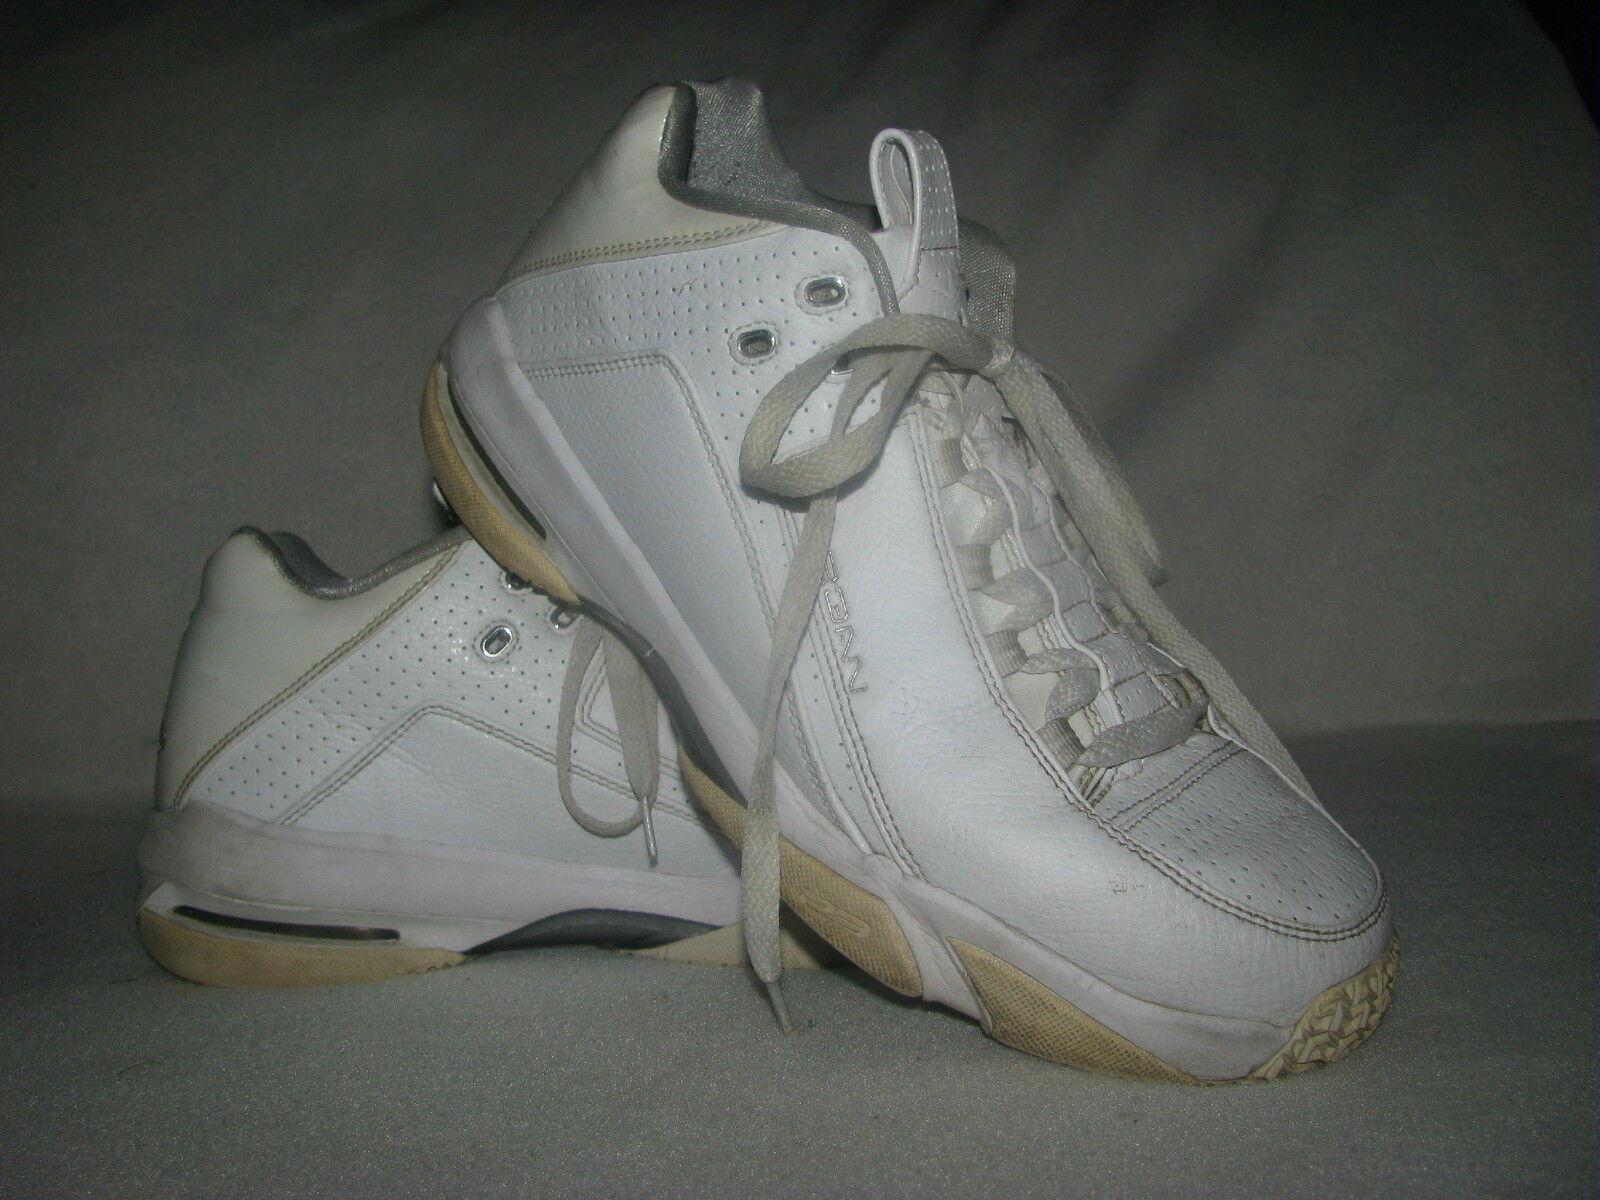 Nike jordan 23 grattacielo uomini sz 10,5 di pelle bianca, scarpe da ginnastica 330378-101 basso | The Queen Of Quality  | Scolaro/Ragazze Scarpa